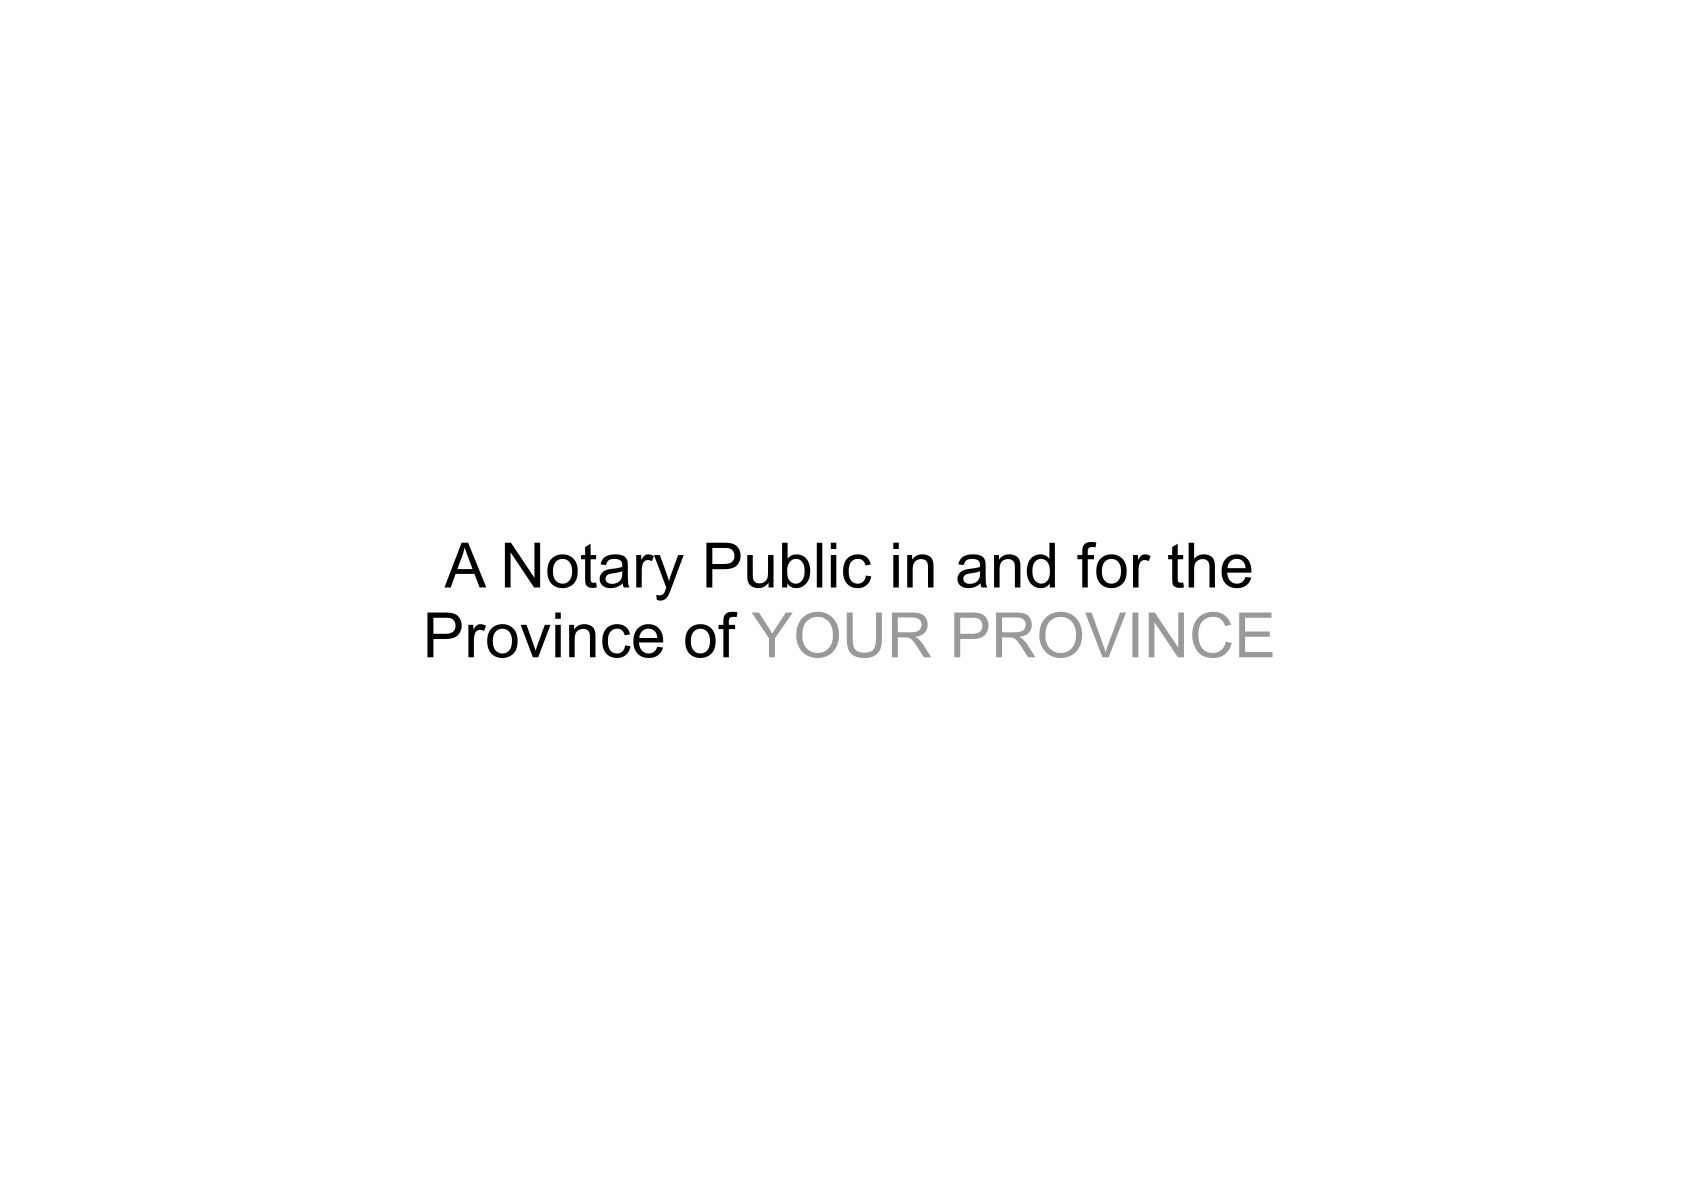 Application One Two Territories Yukon Territories 21 California Notary